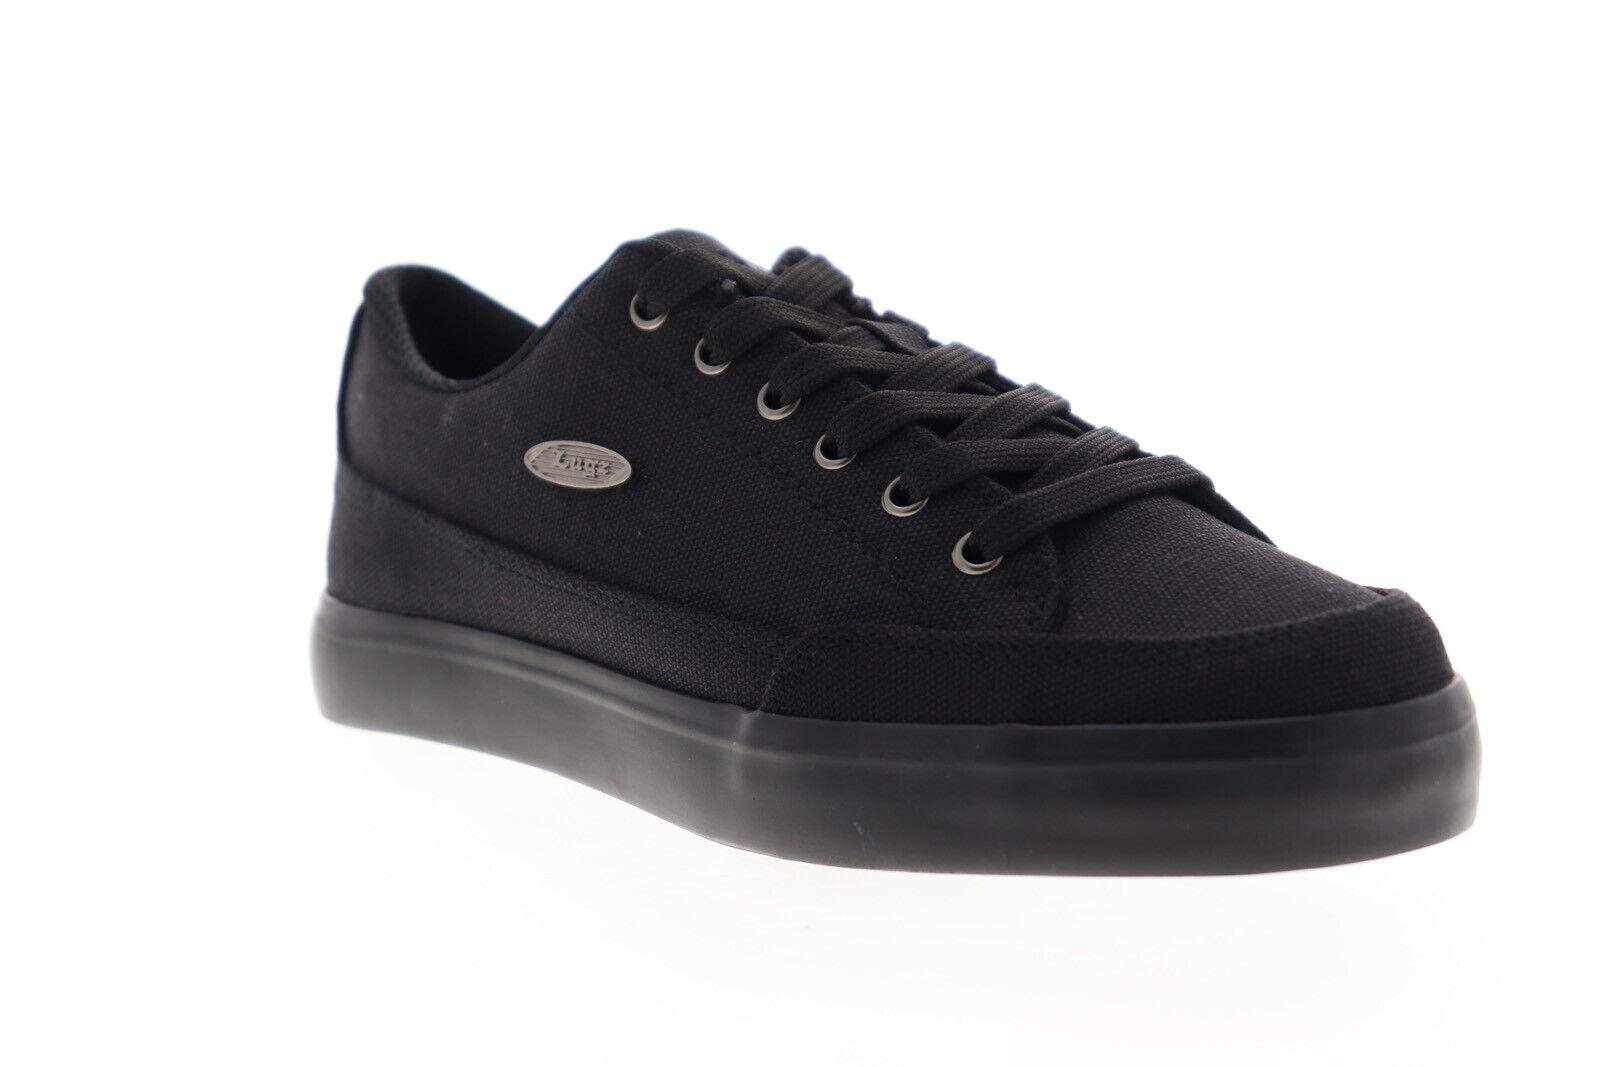 Lugz Colony CC MCOLCC-001 Mens Black Canvas Low Top Lifestyle Sneakers Shoes